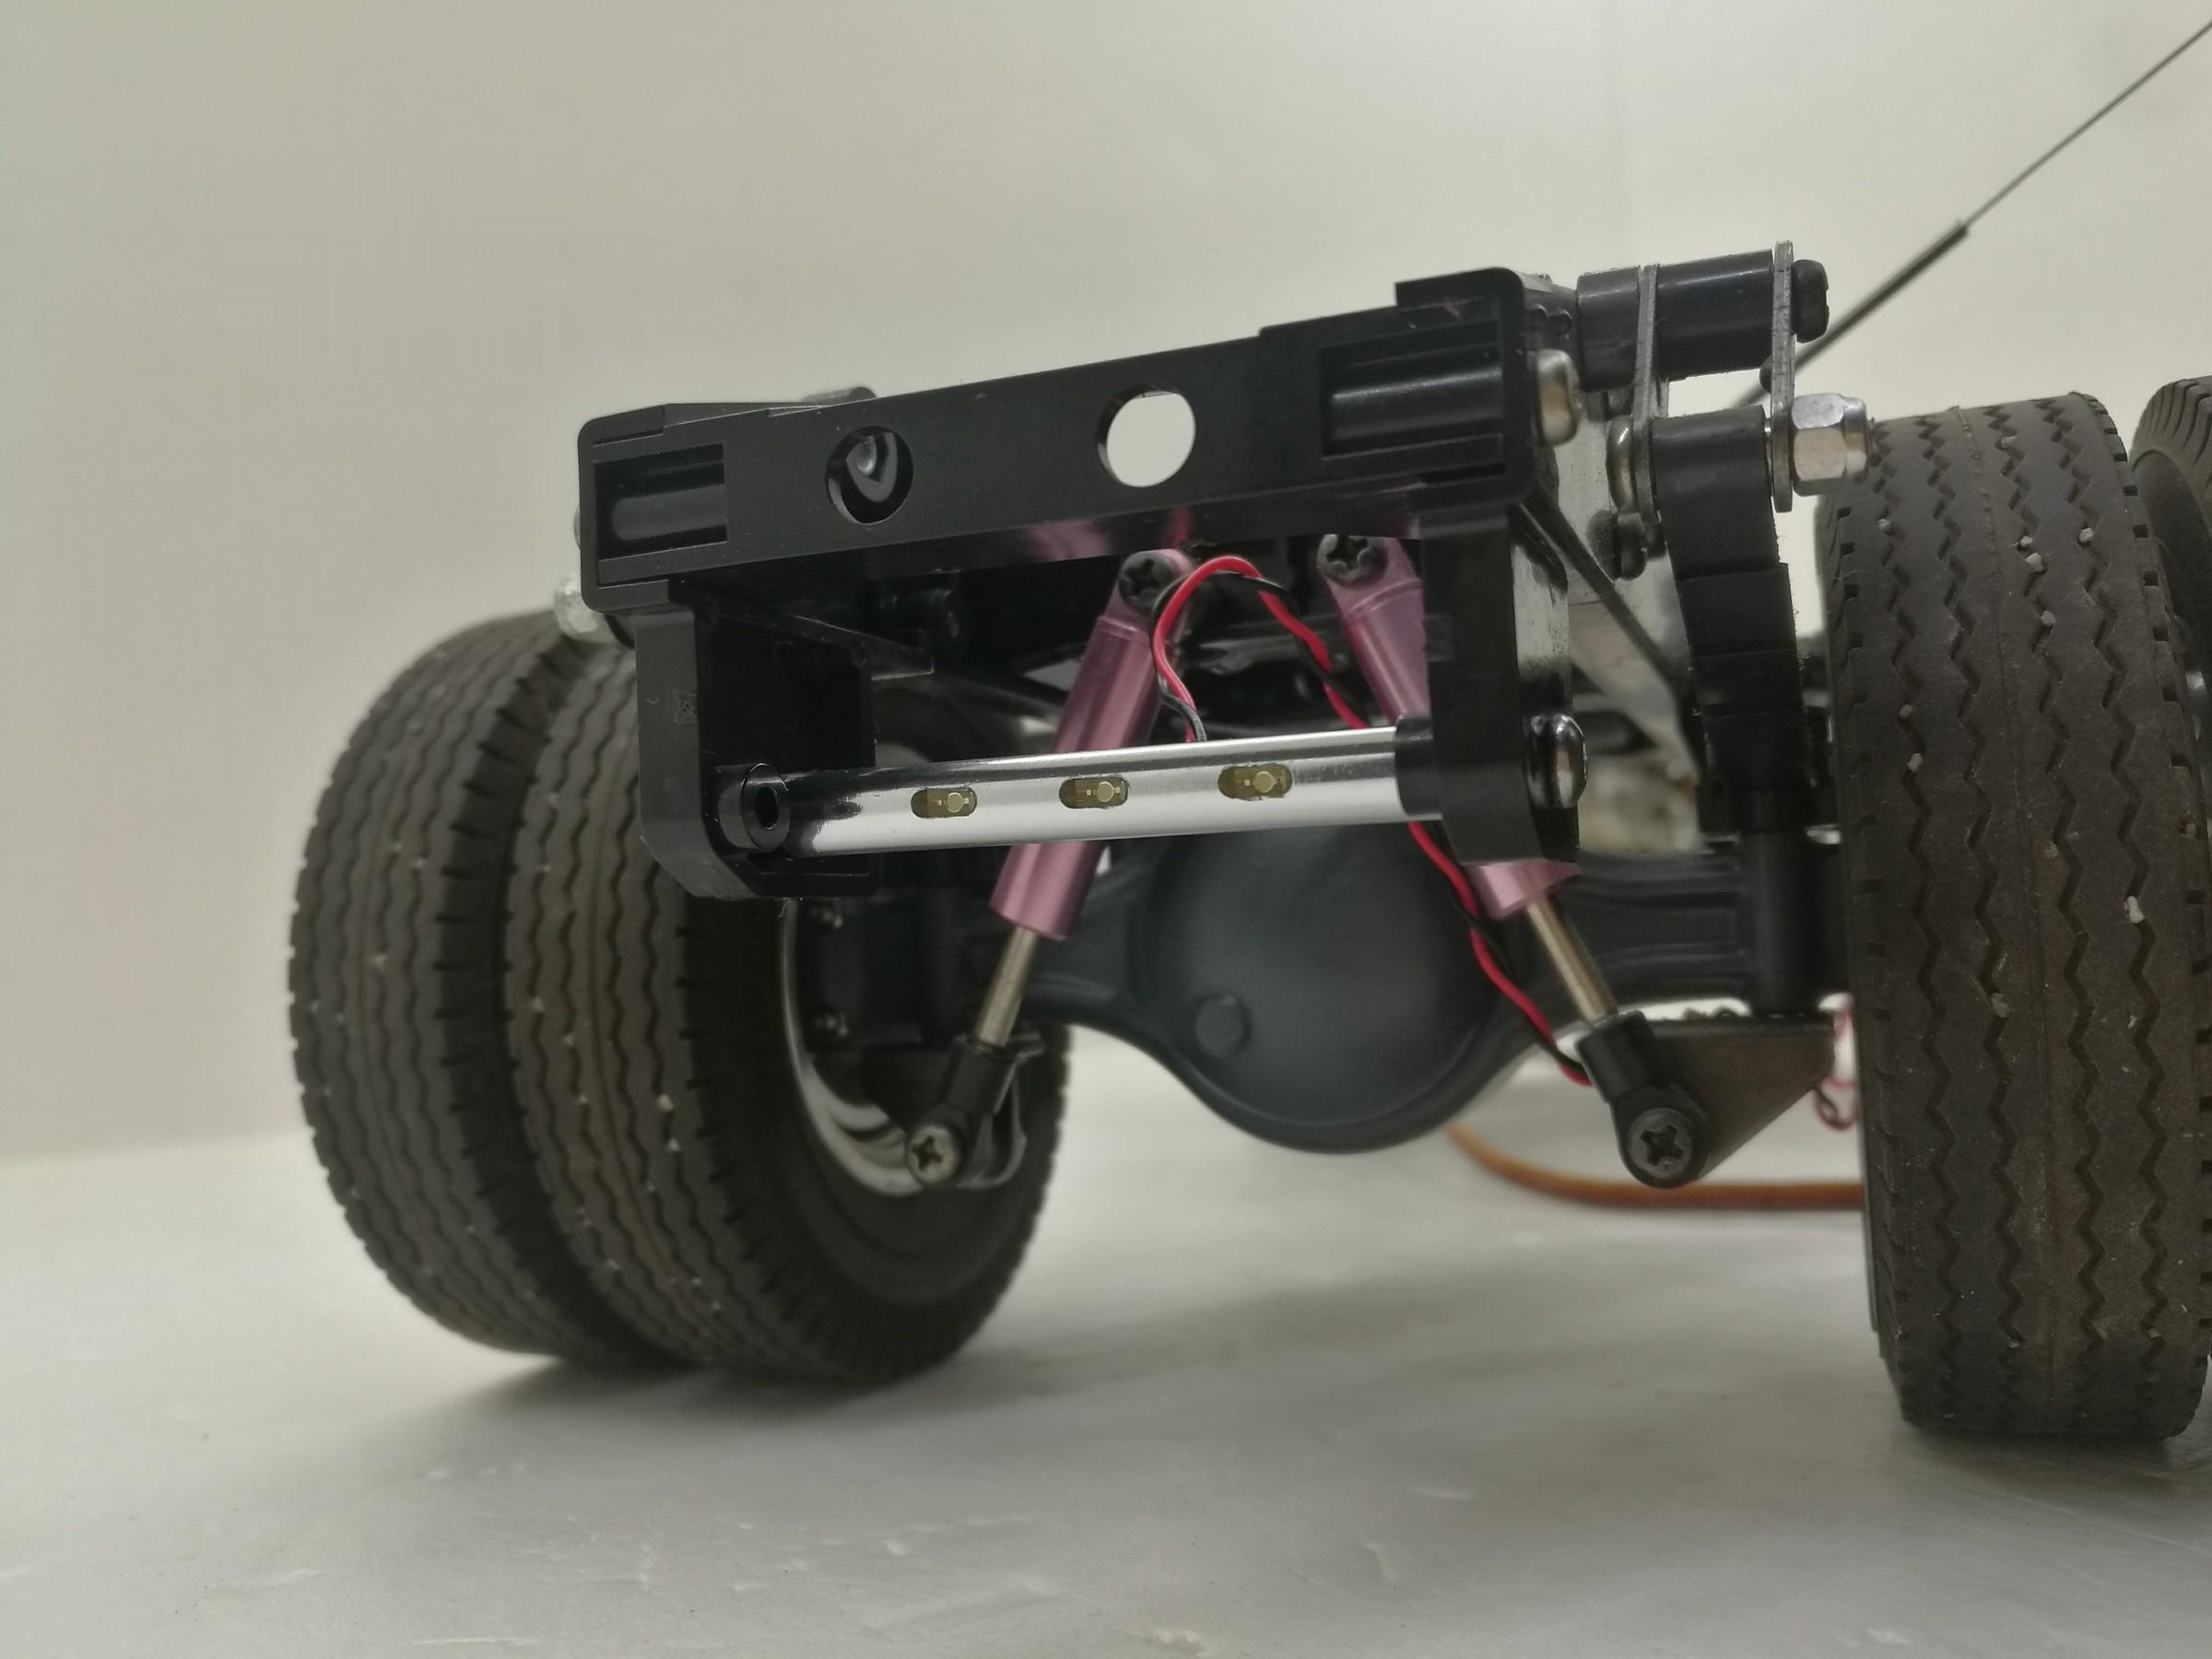 Led Aluminum rod Tail beam Pole light taillight Refit lamp For 1/14 Tamiya RC Truck car 56360 56323 Scania ACTROS MAN AROCS enlarge